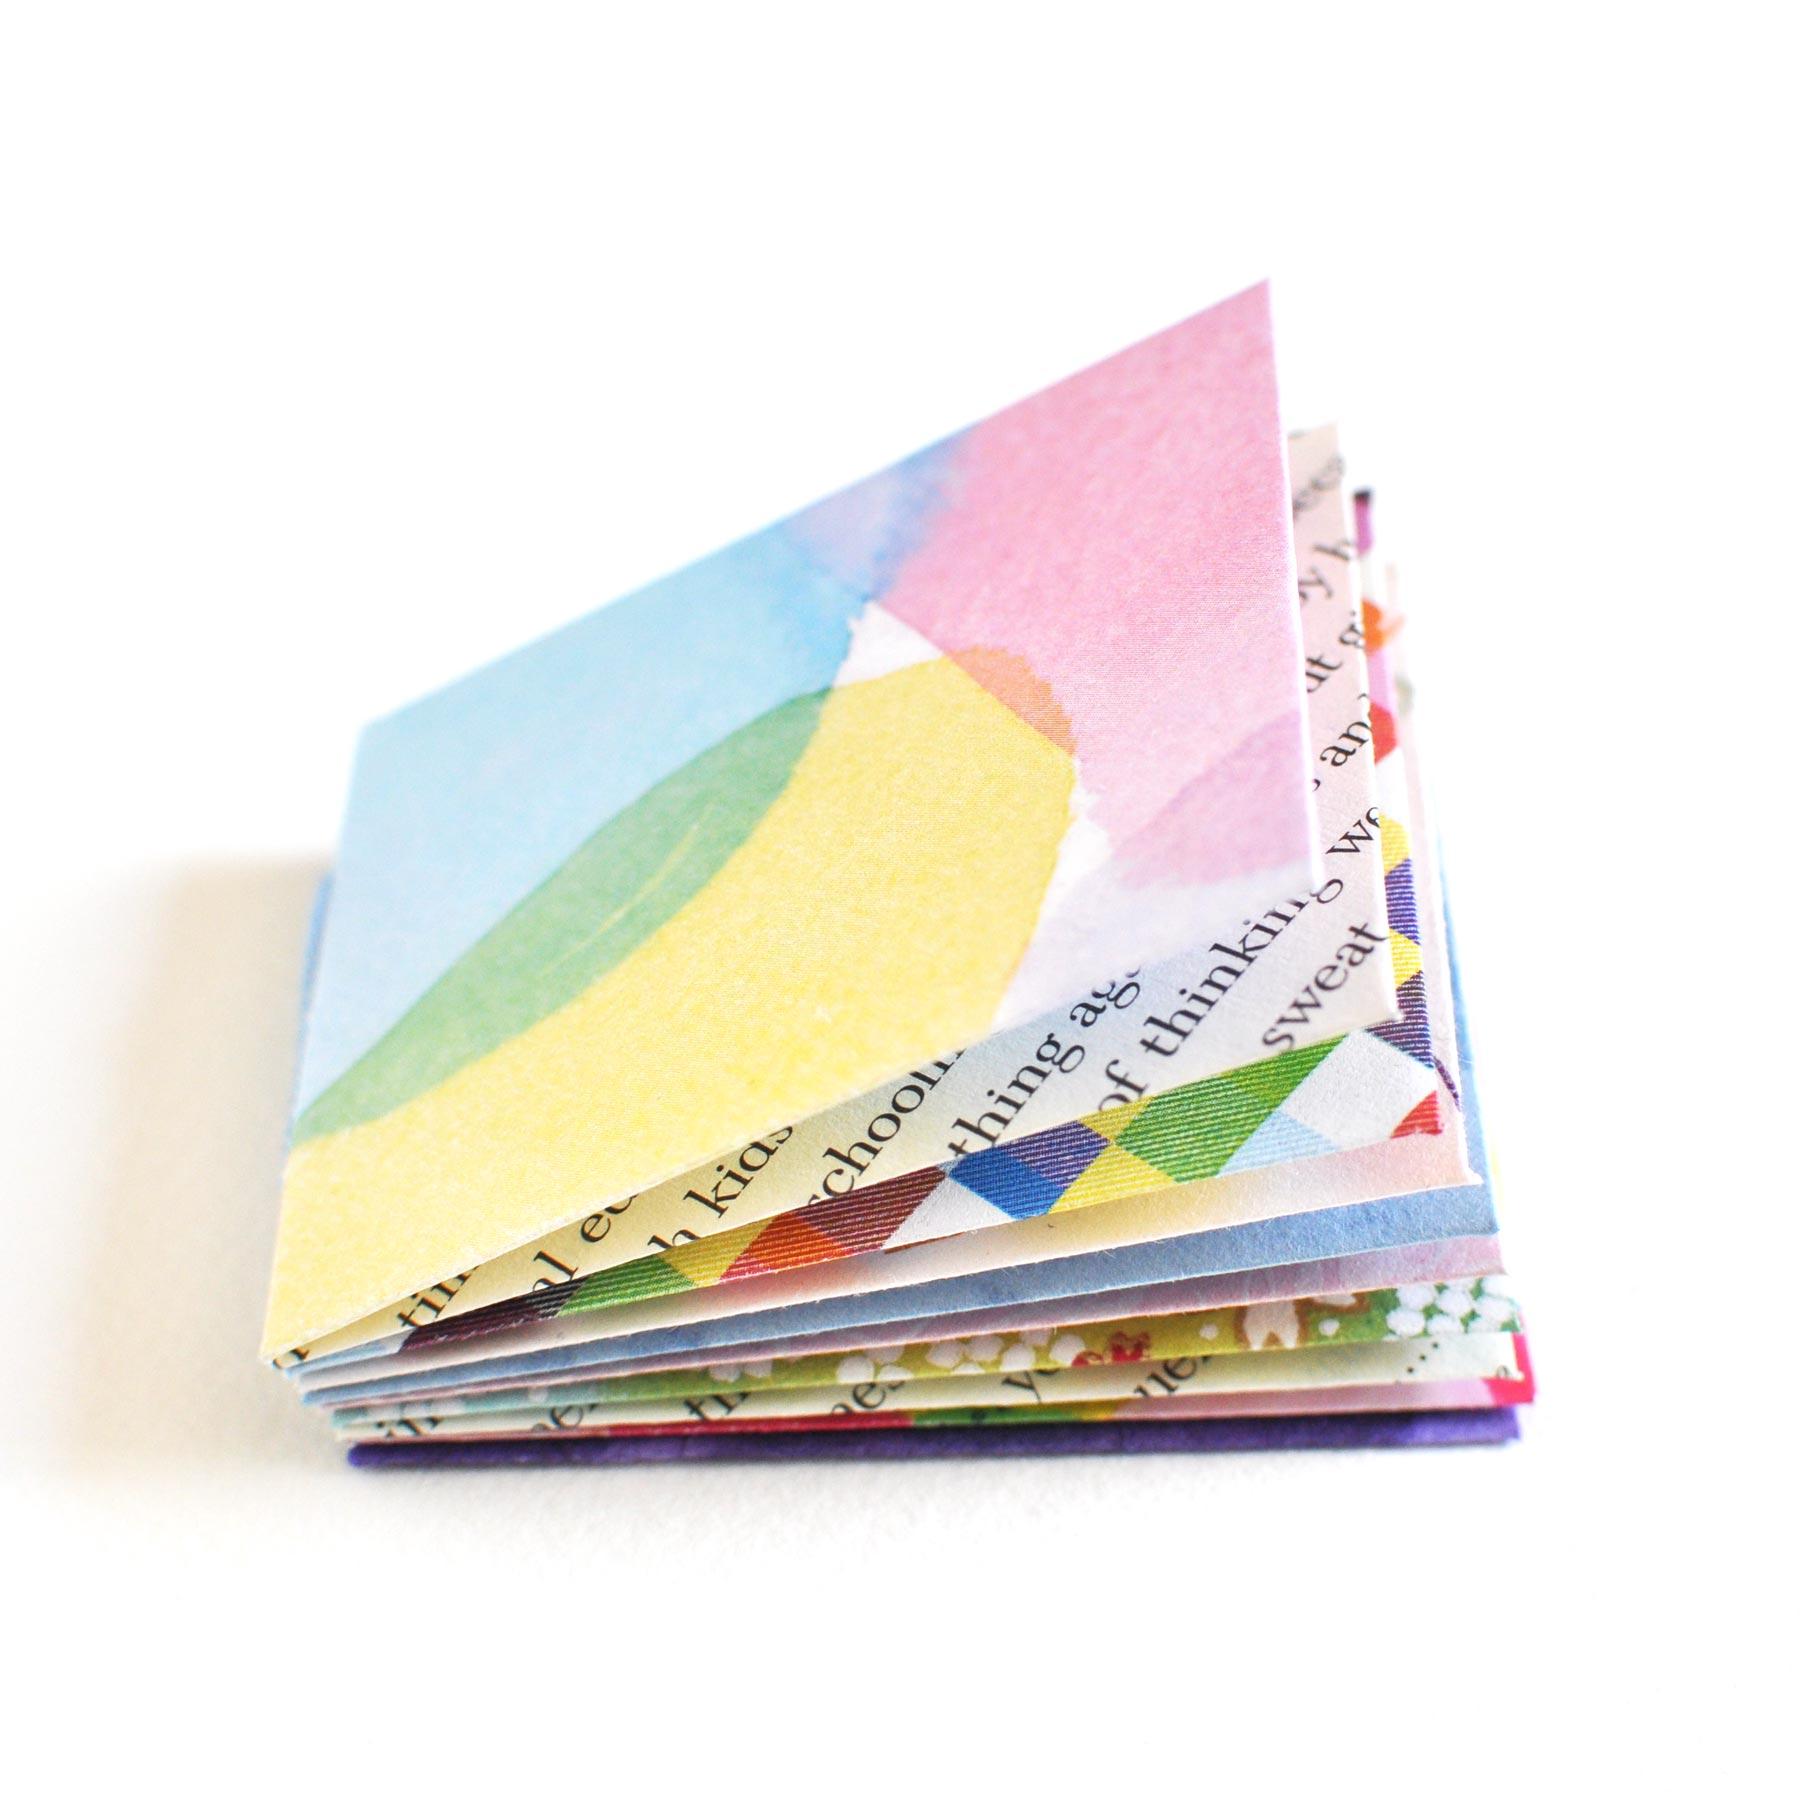 Envelope-Journal-Image-6.jpg